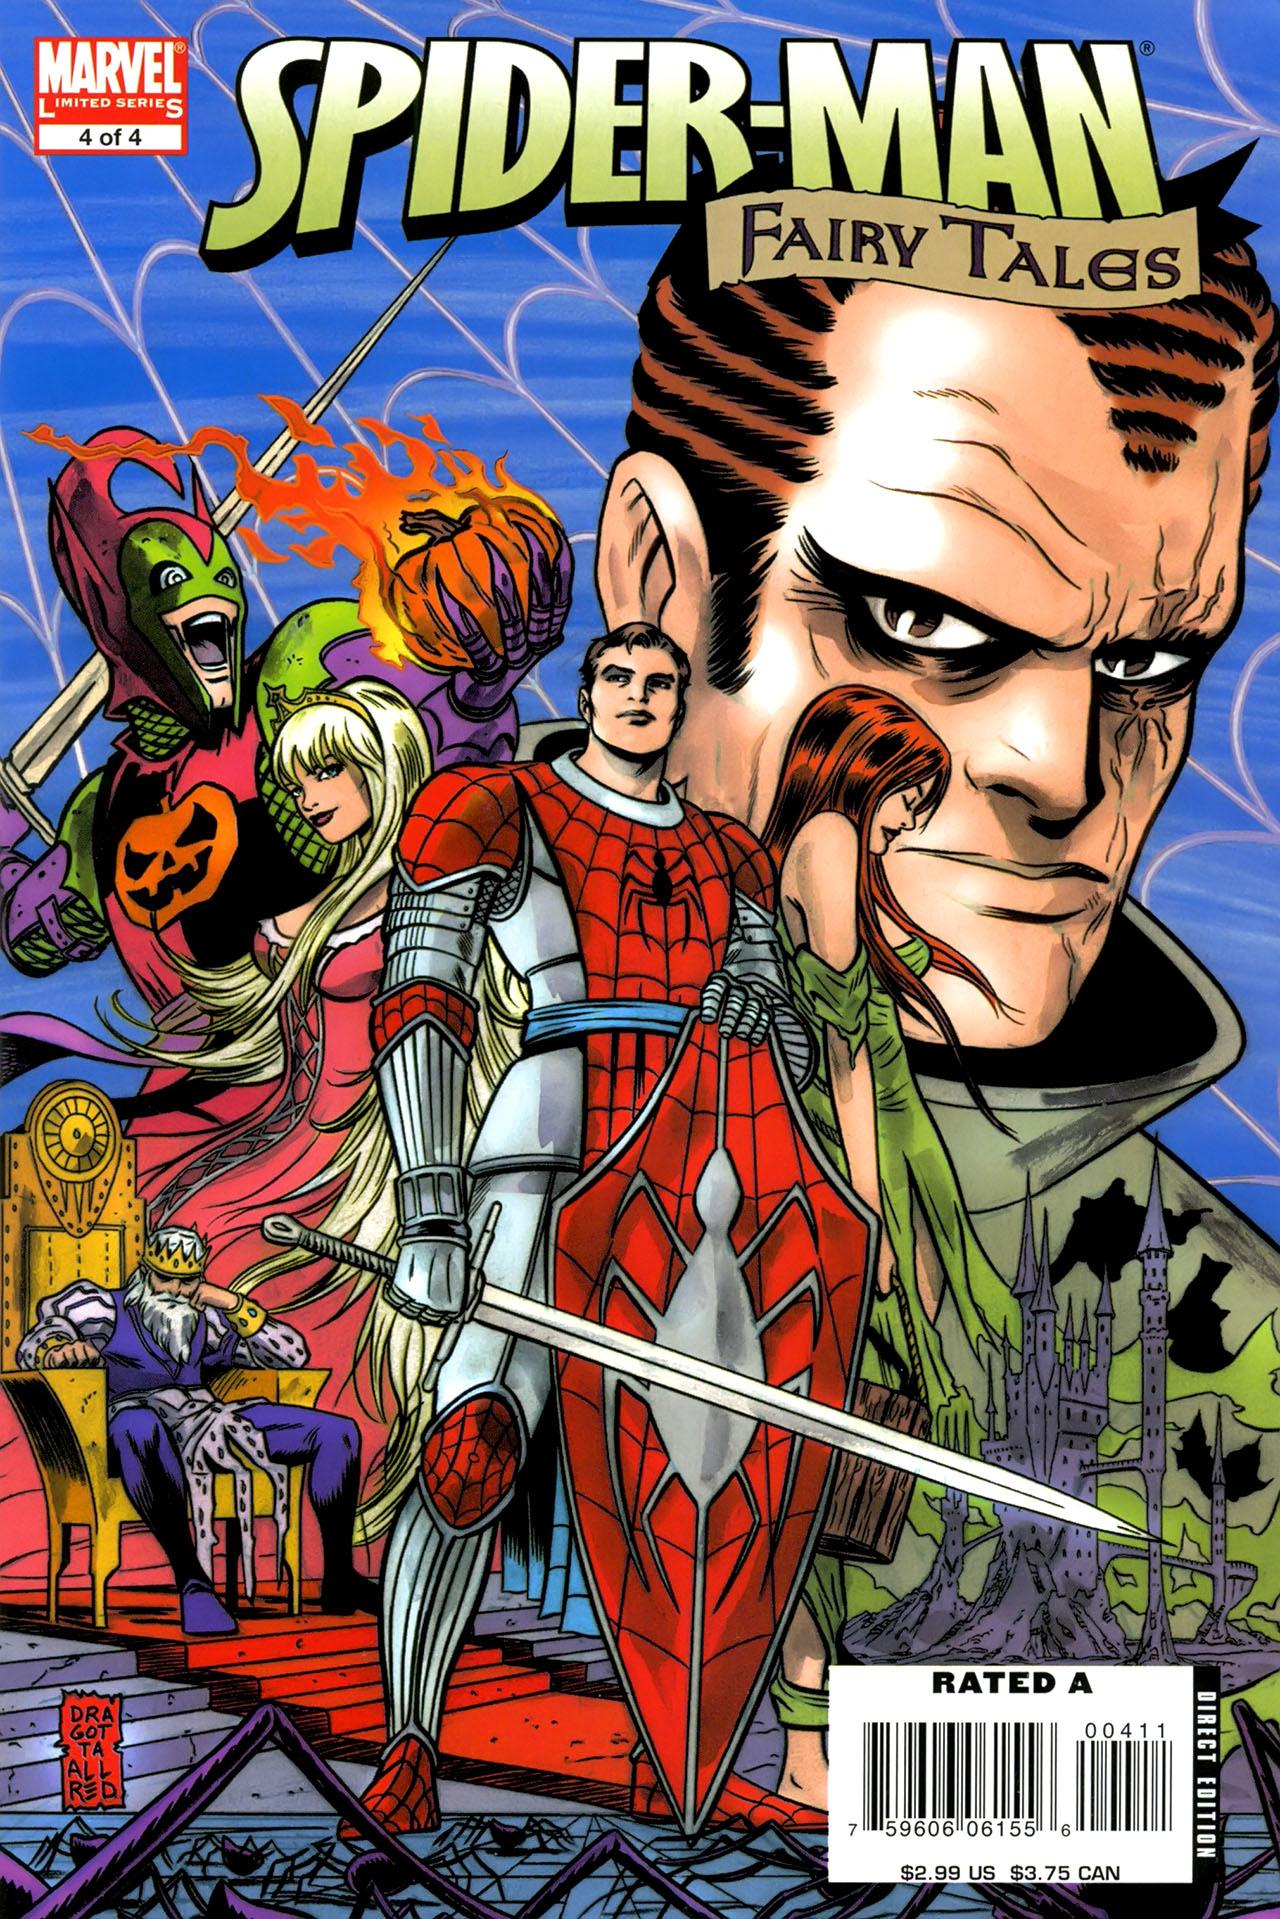 Spider-Man: Fairy Tales Vol 1 4